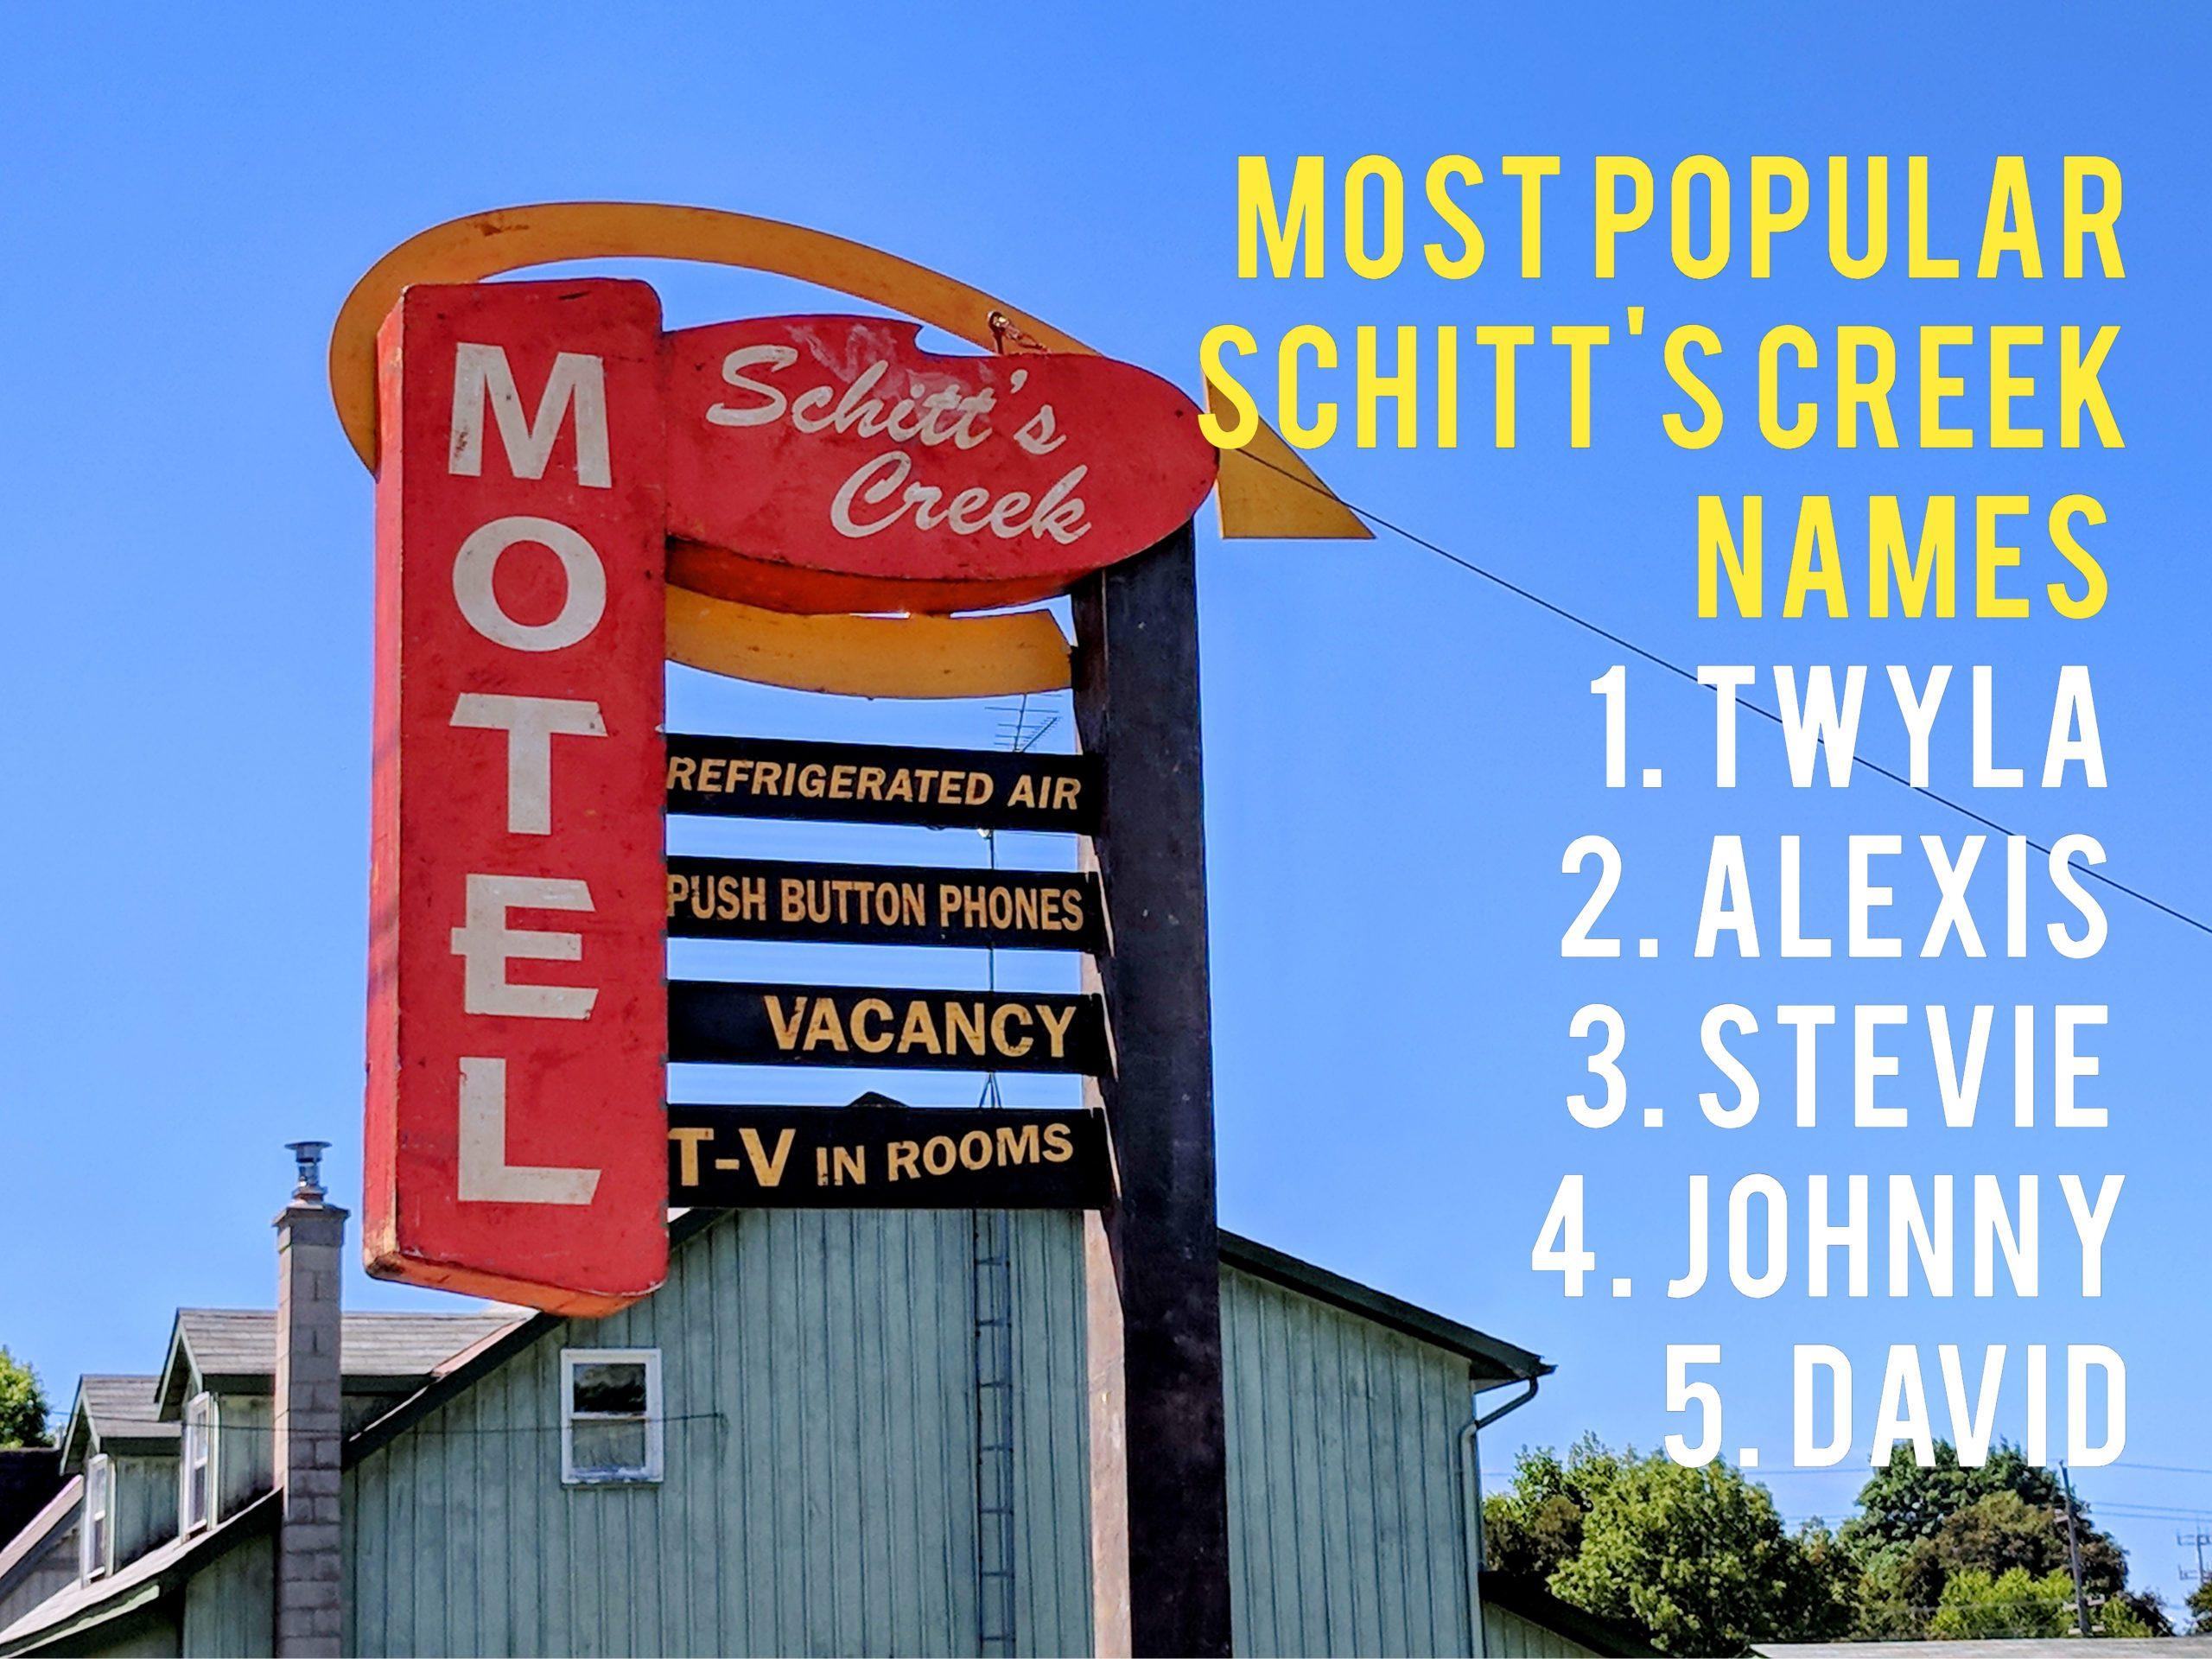 Most popular dog names in Canada 2020 - Schitt's Creek names